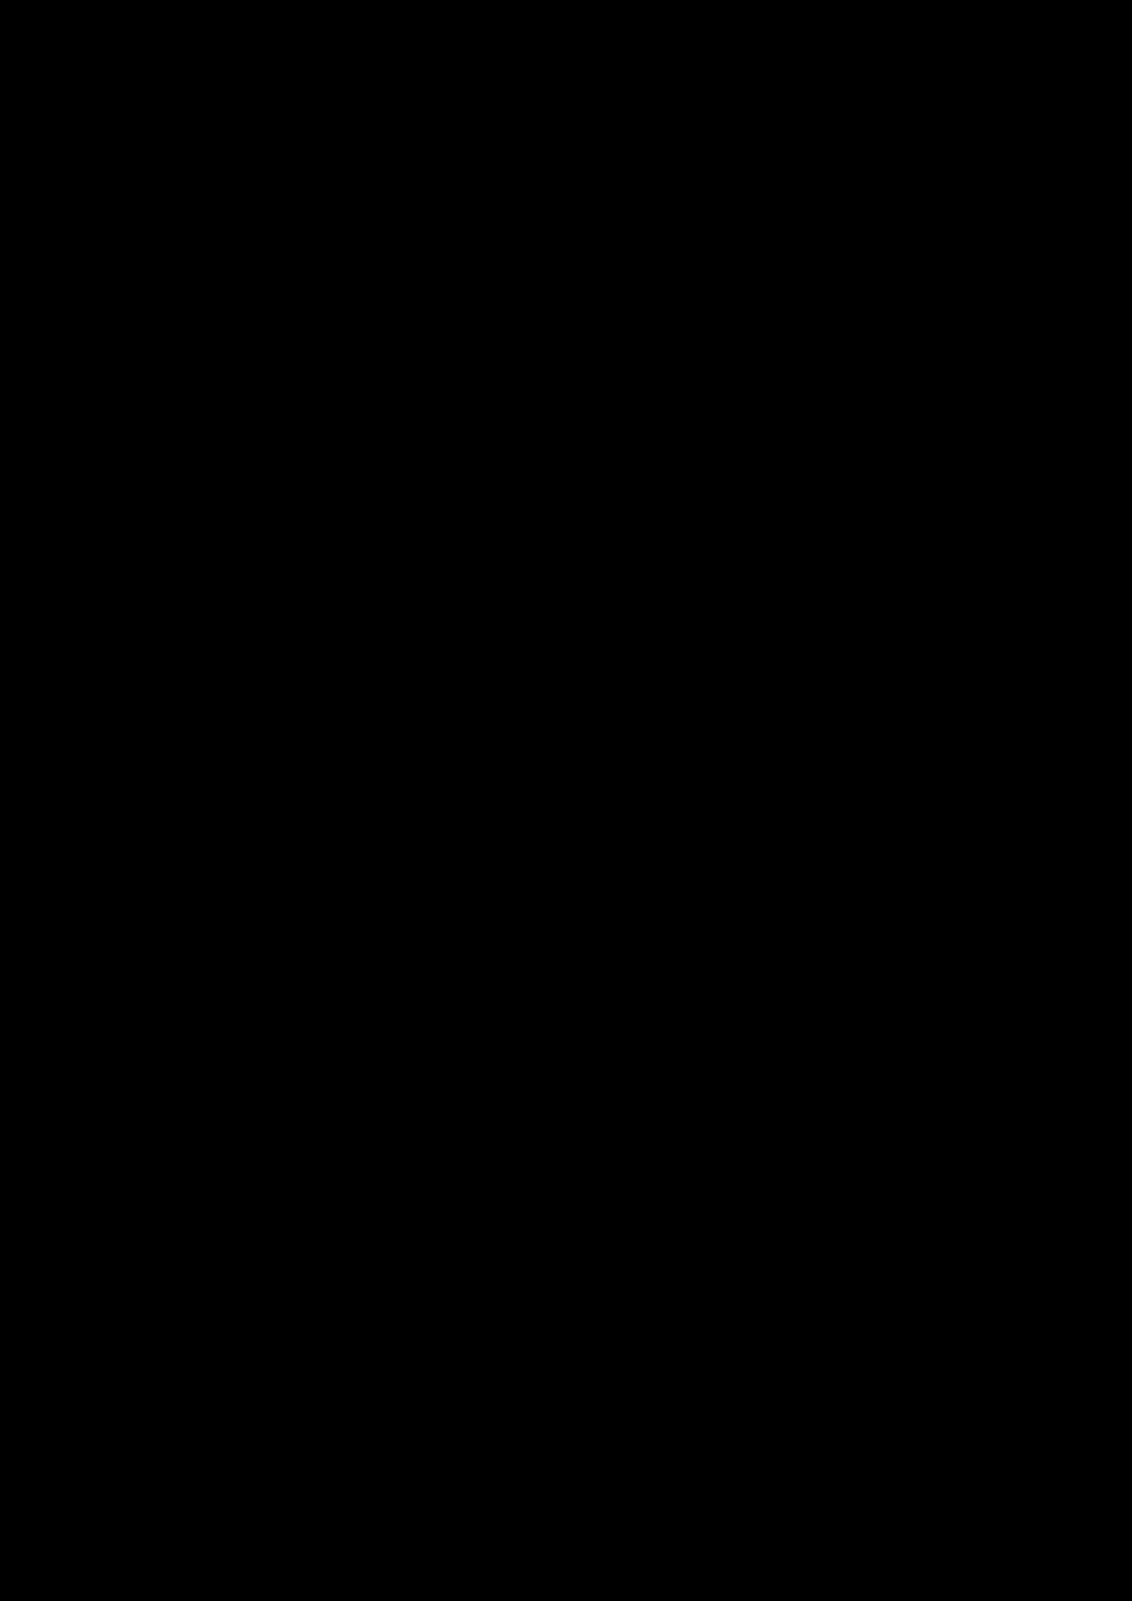 Ispoved Pervogo Boga slide, Image 52